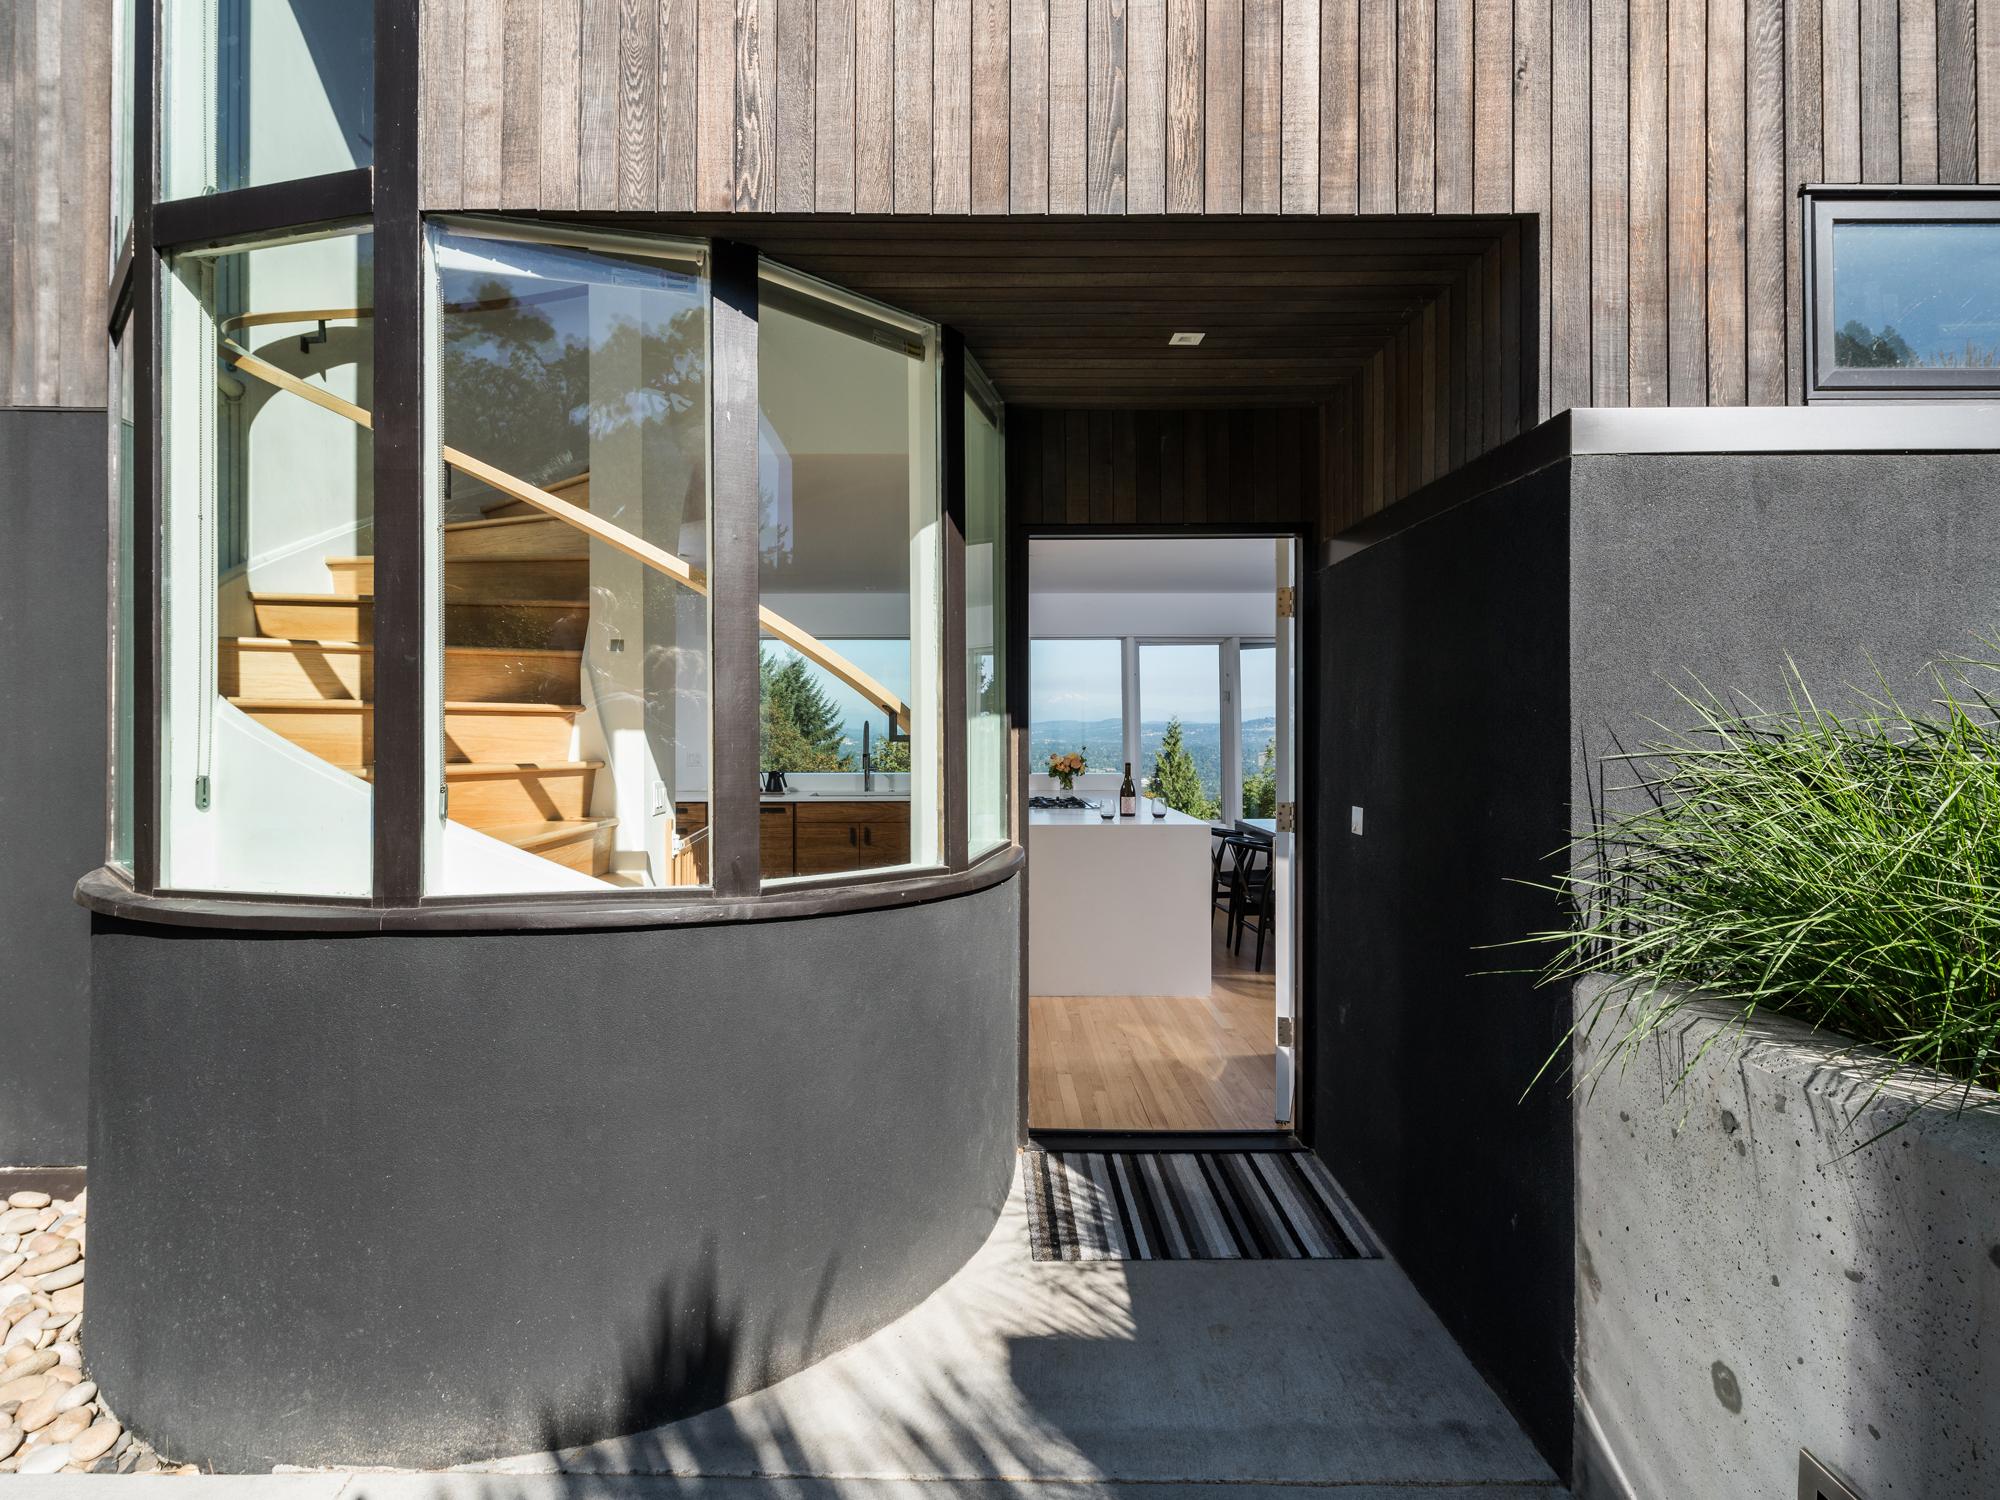 Van Evera Bailey Sinclair House by In Situ Architecture 02.jpg